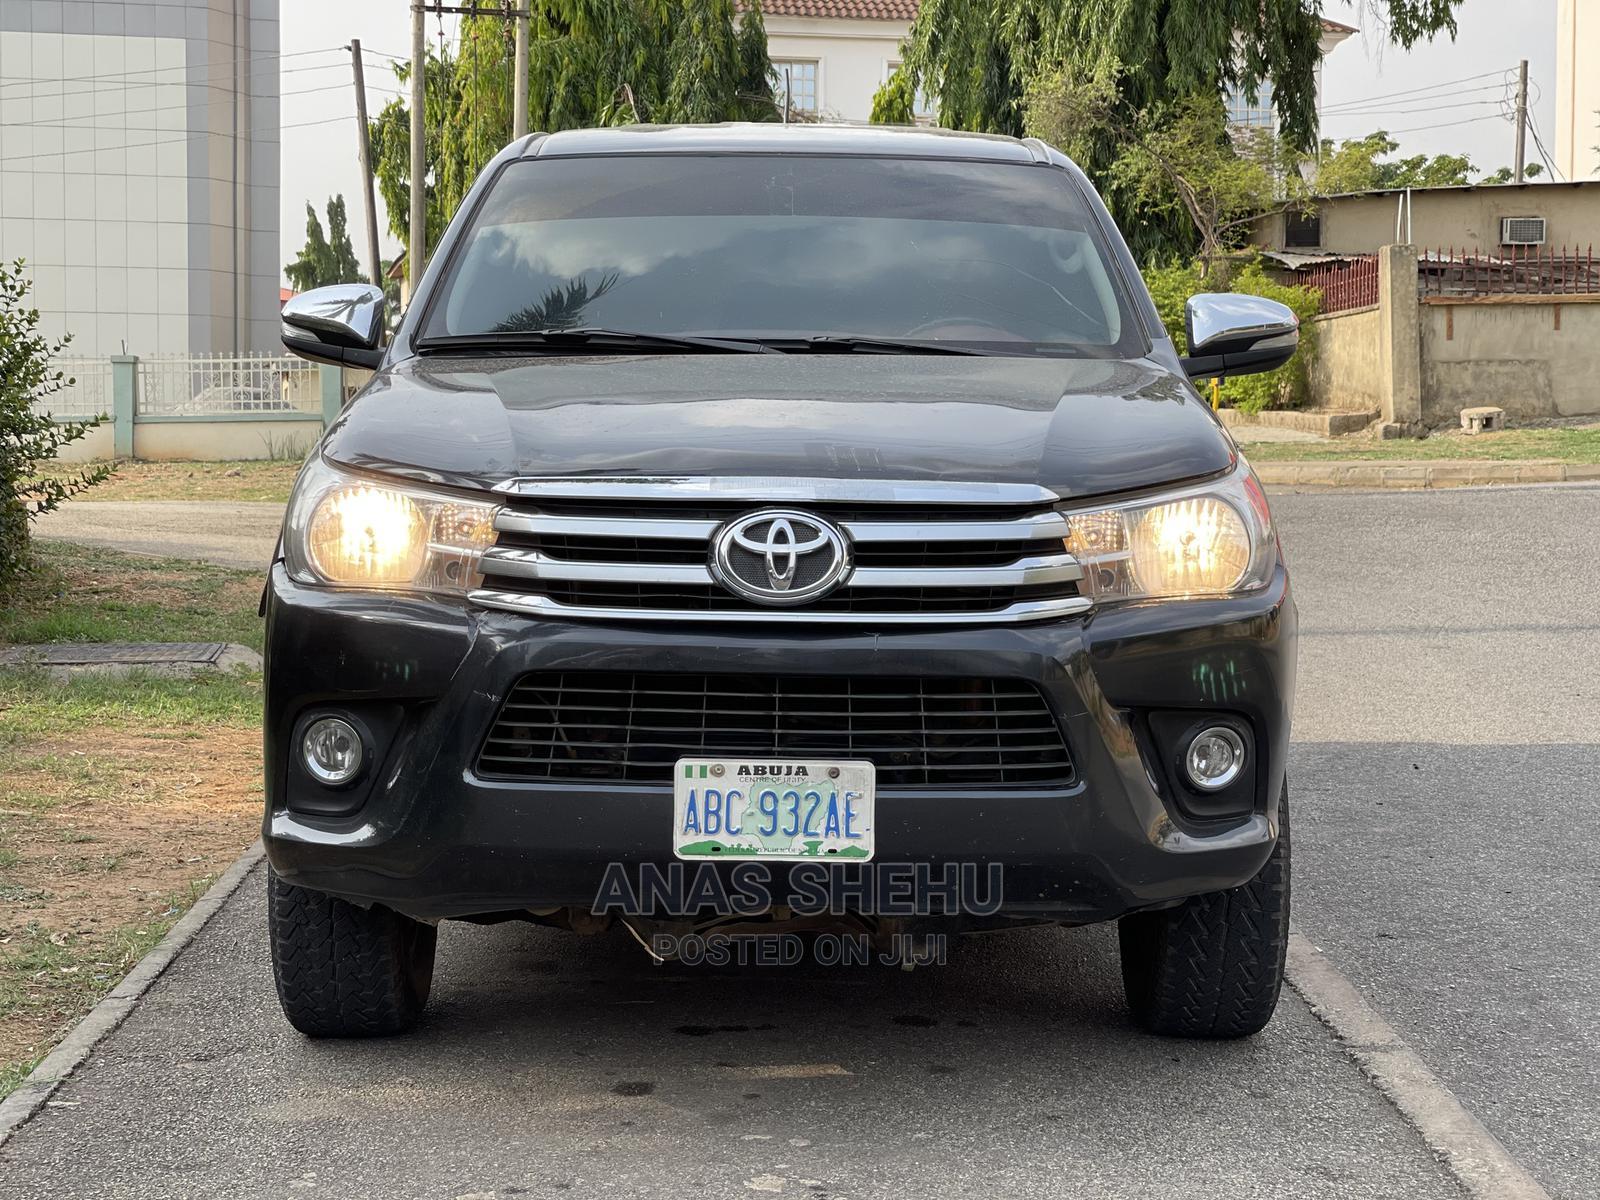 Toyota Hilux 2014 SR 4x4 Black | Cars for sale in Asokoro, Abuja (FCT) State, Nigeria